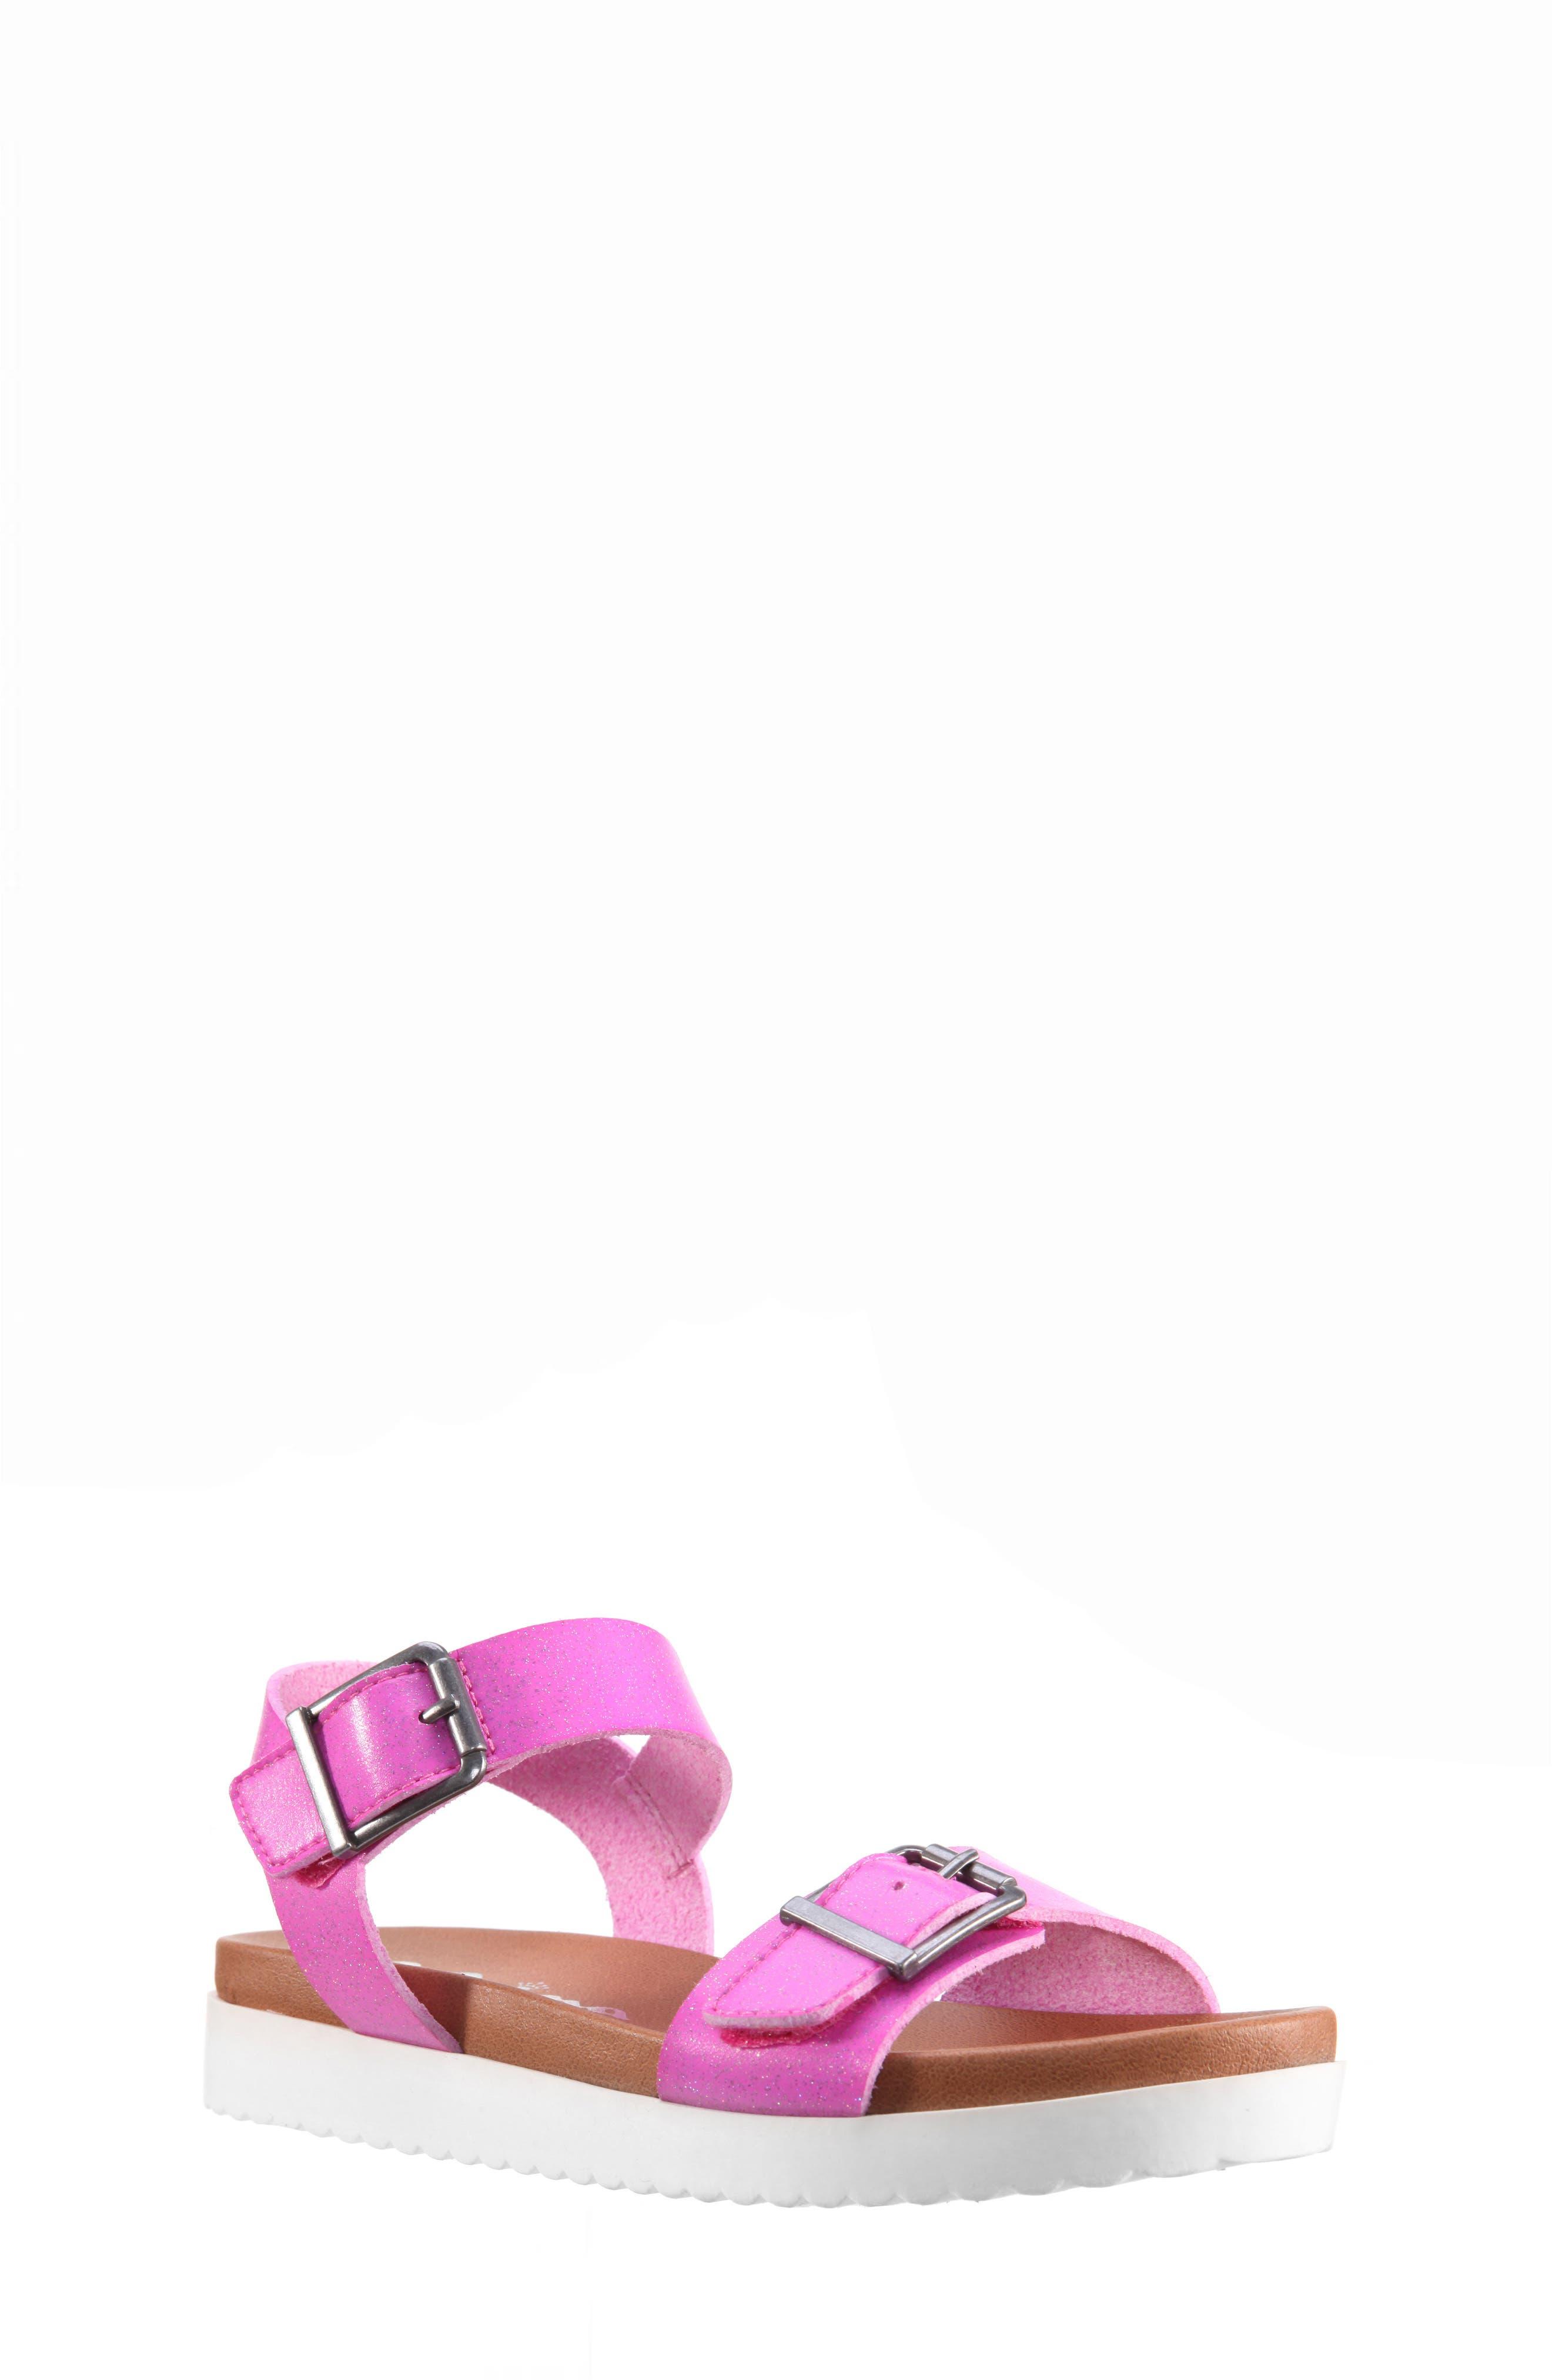 Jacklin3 Quarter Strap Sandal,                             Main thumbnail 1, color,                             Pink Dip Dye